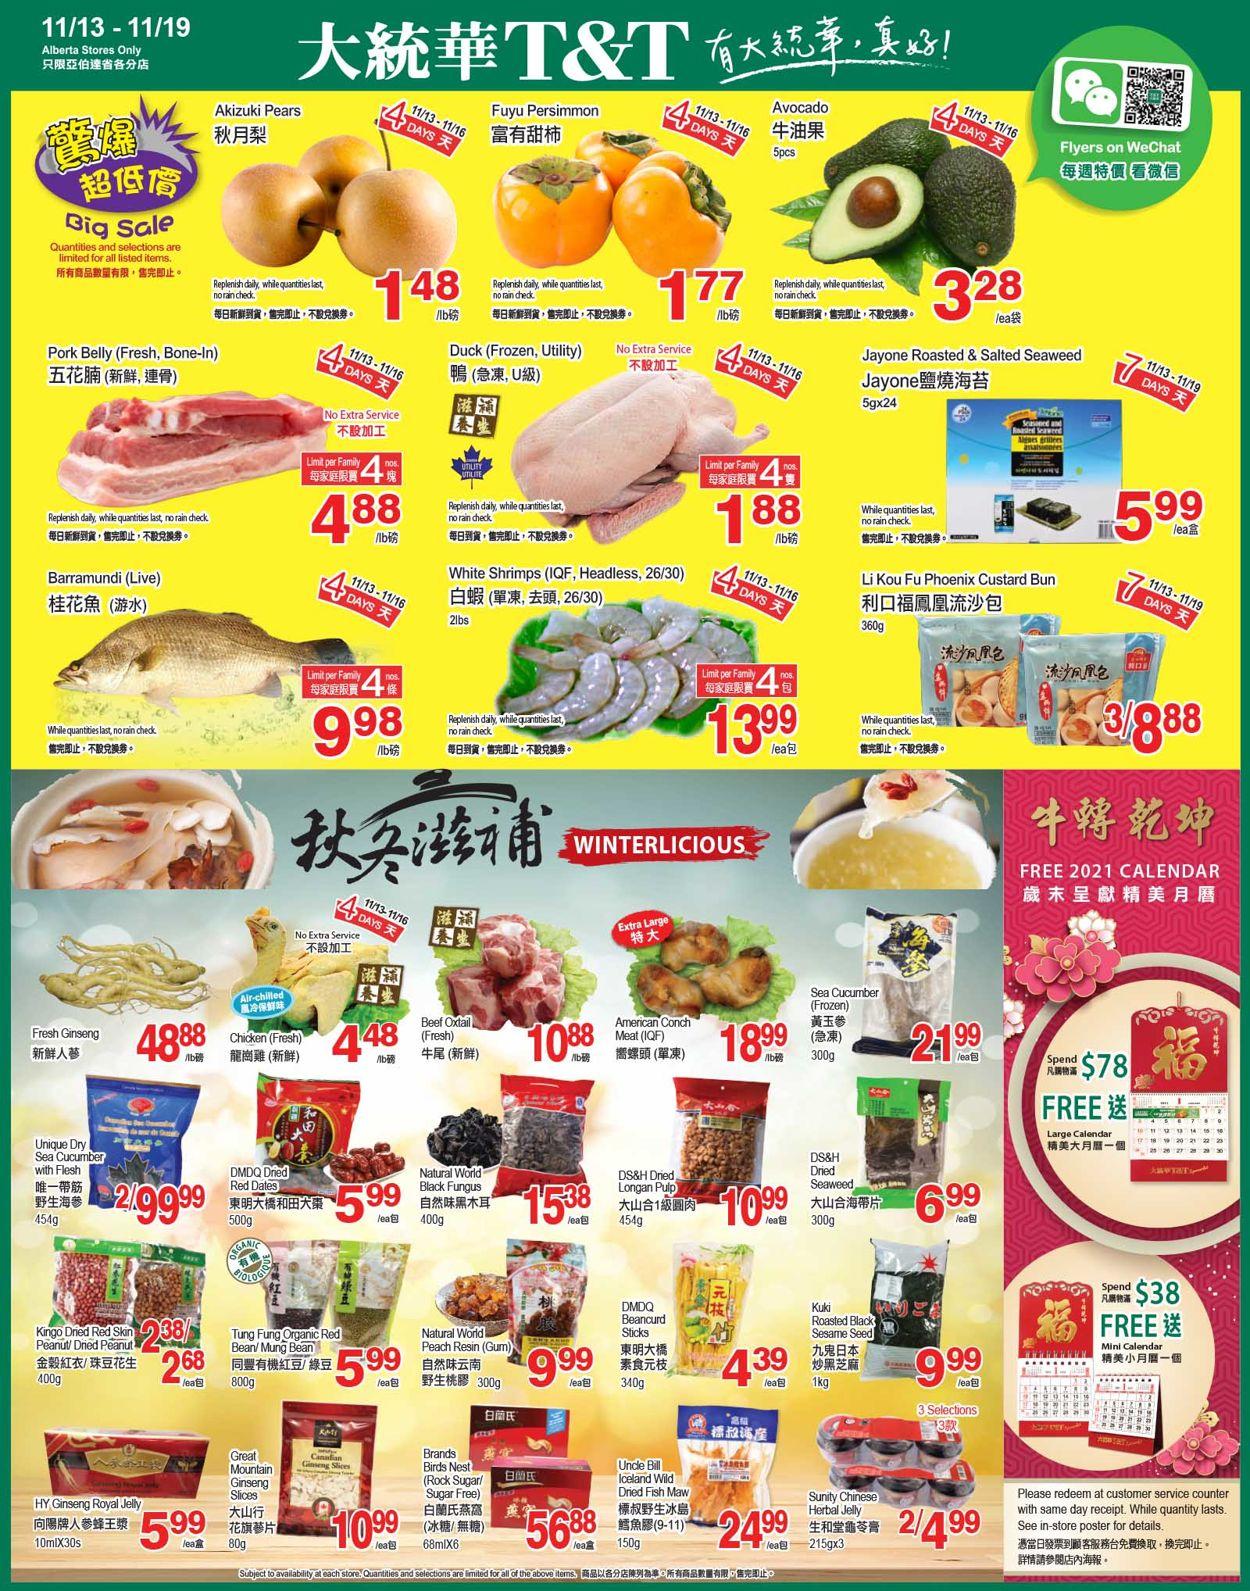 T&T Supermarket - Alberta Flyer - 11/13-11/19/2020